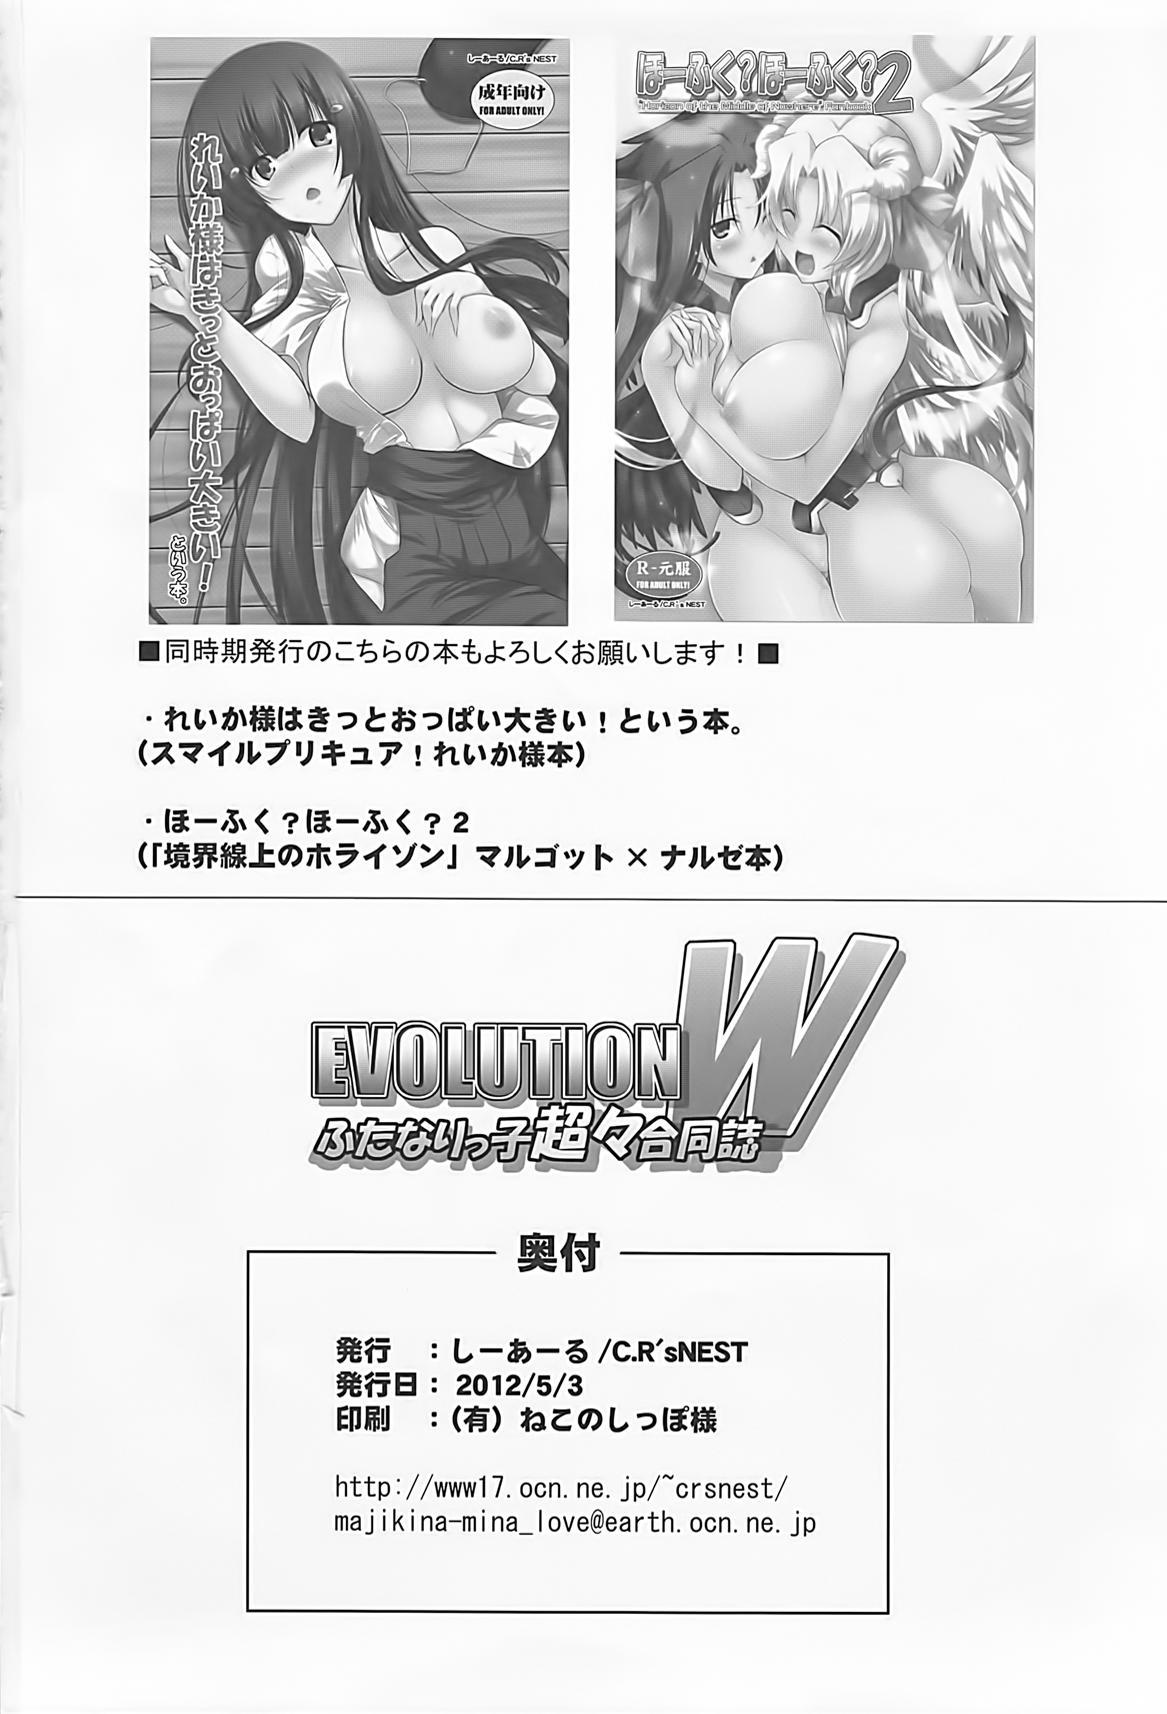 EVOLUTION W 57